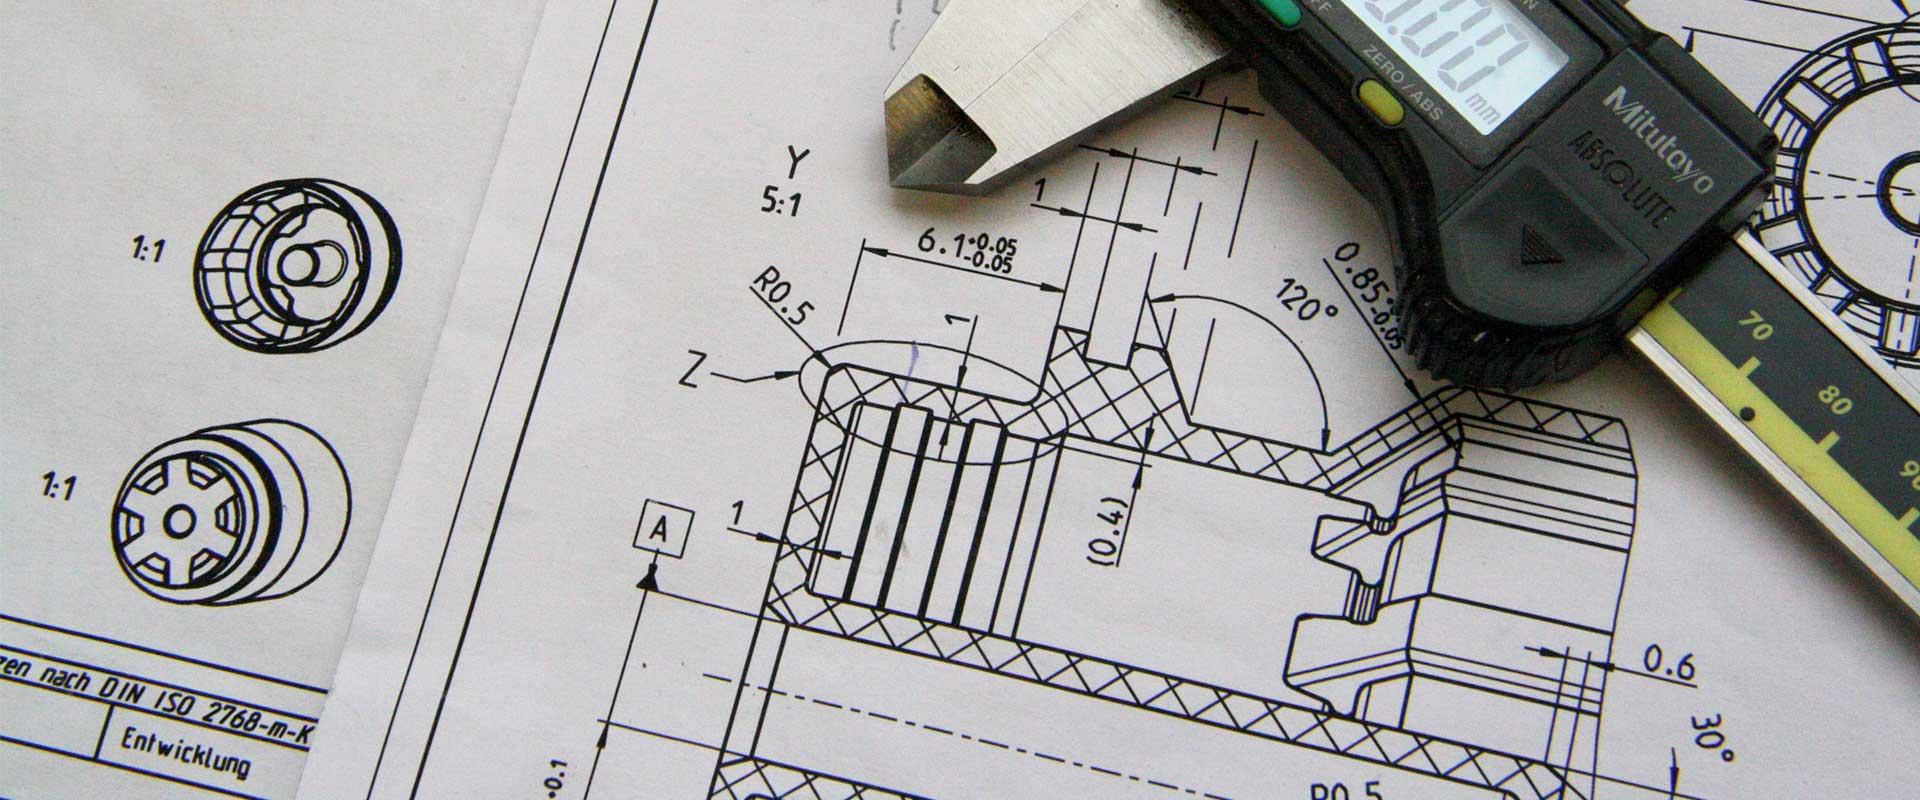 Entwicklung Maschinenbau